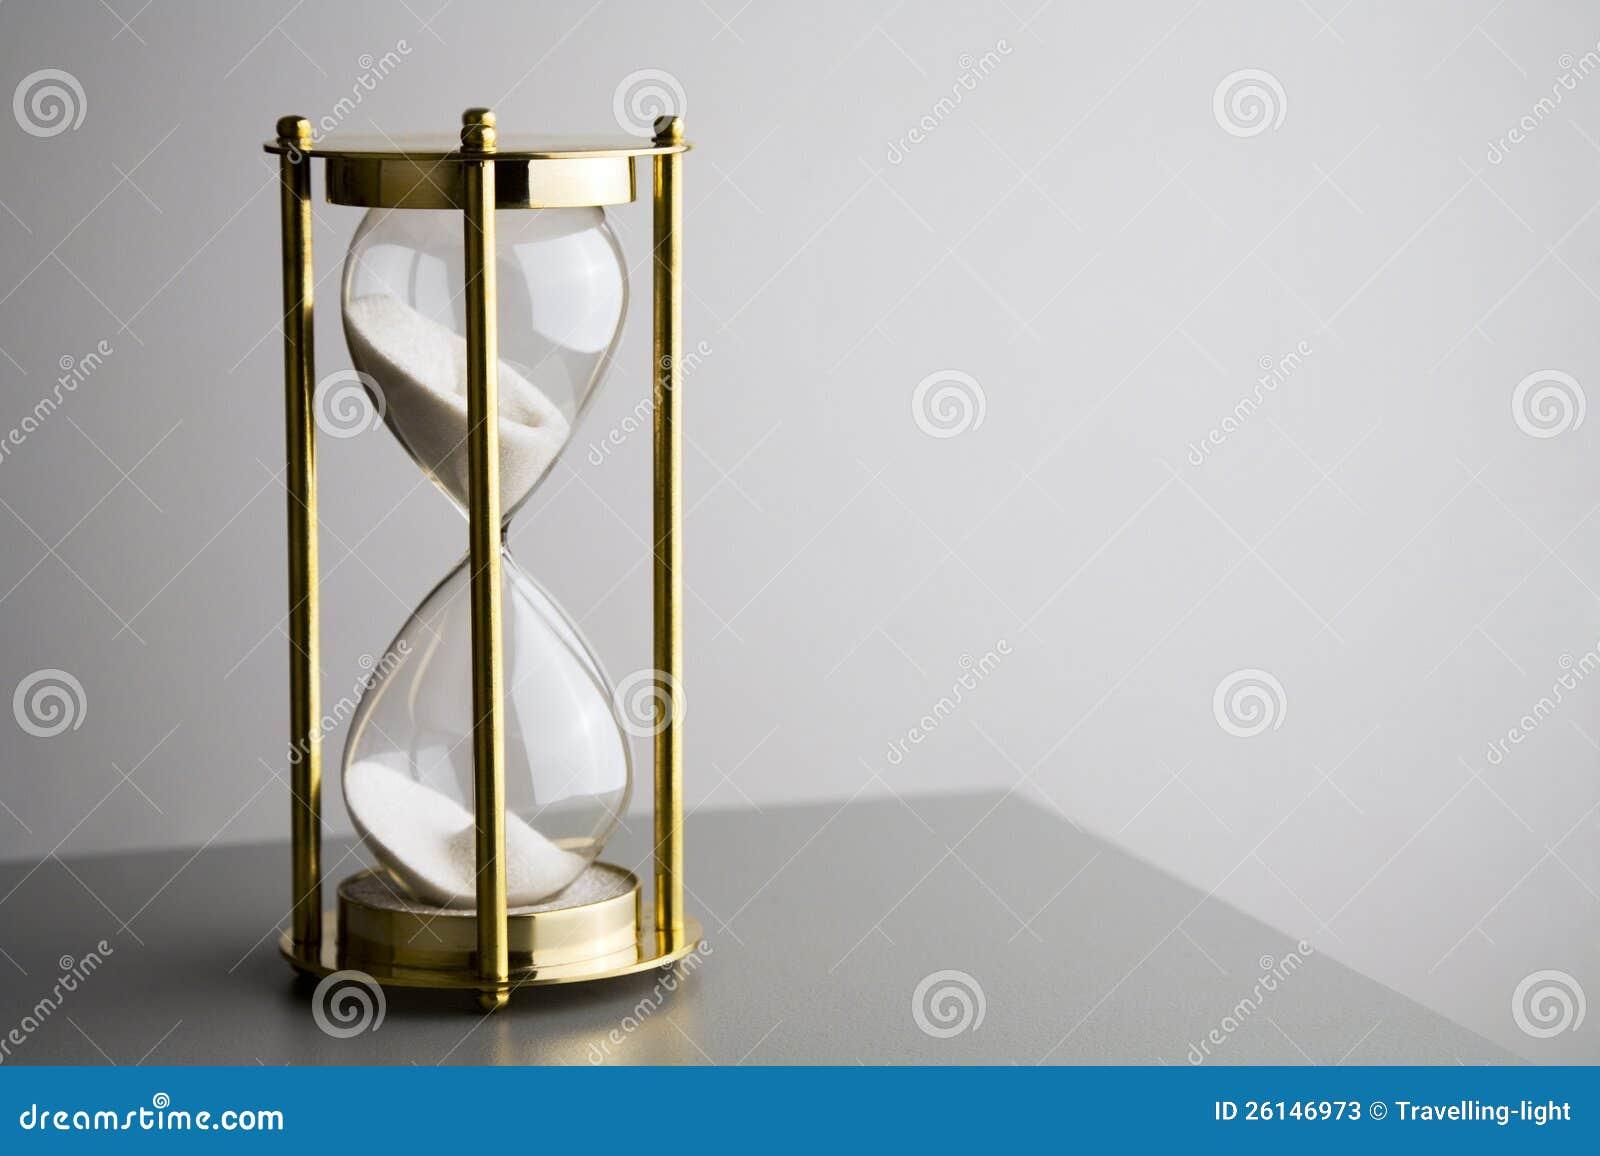 Hourglass on Grey